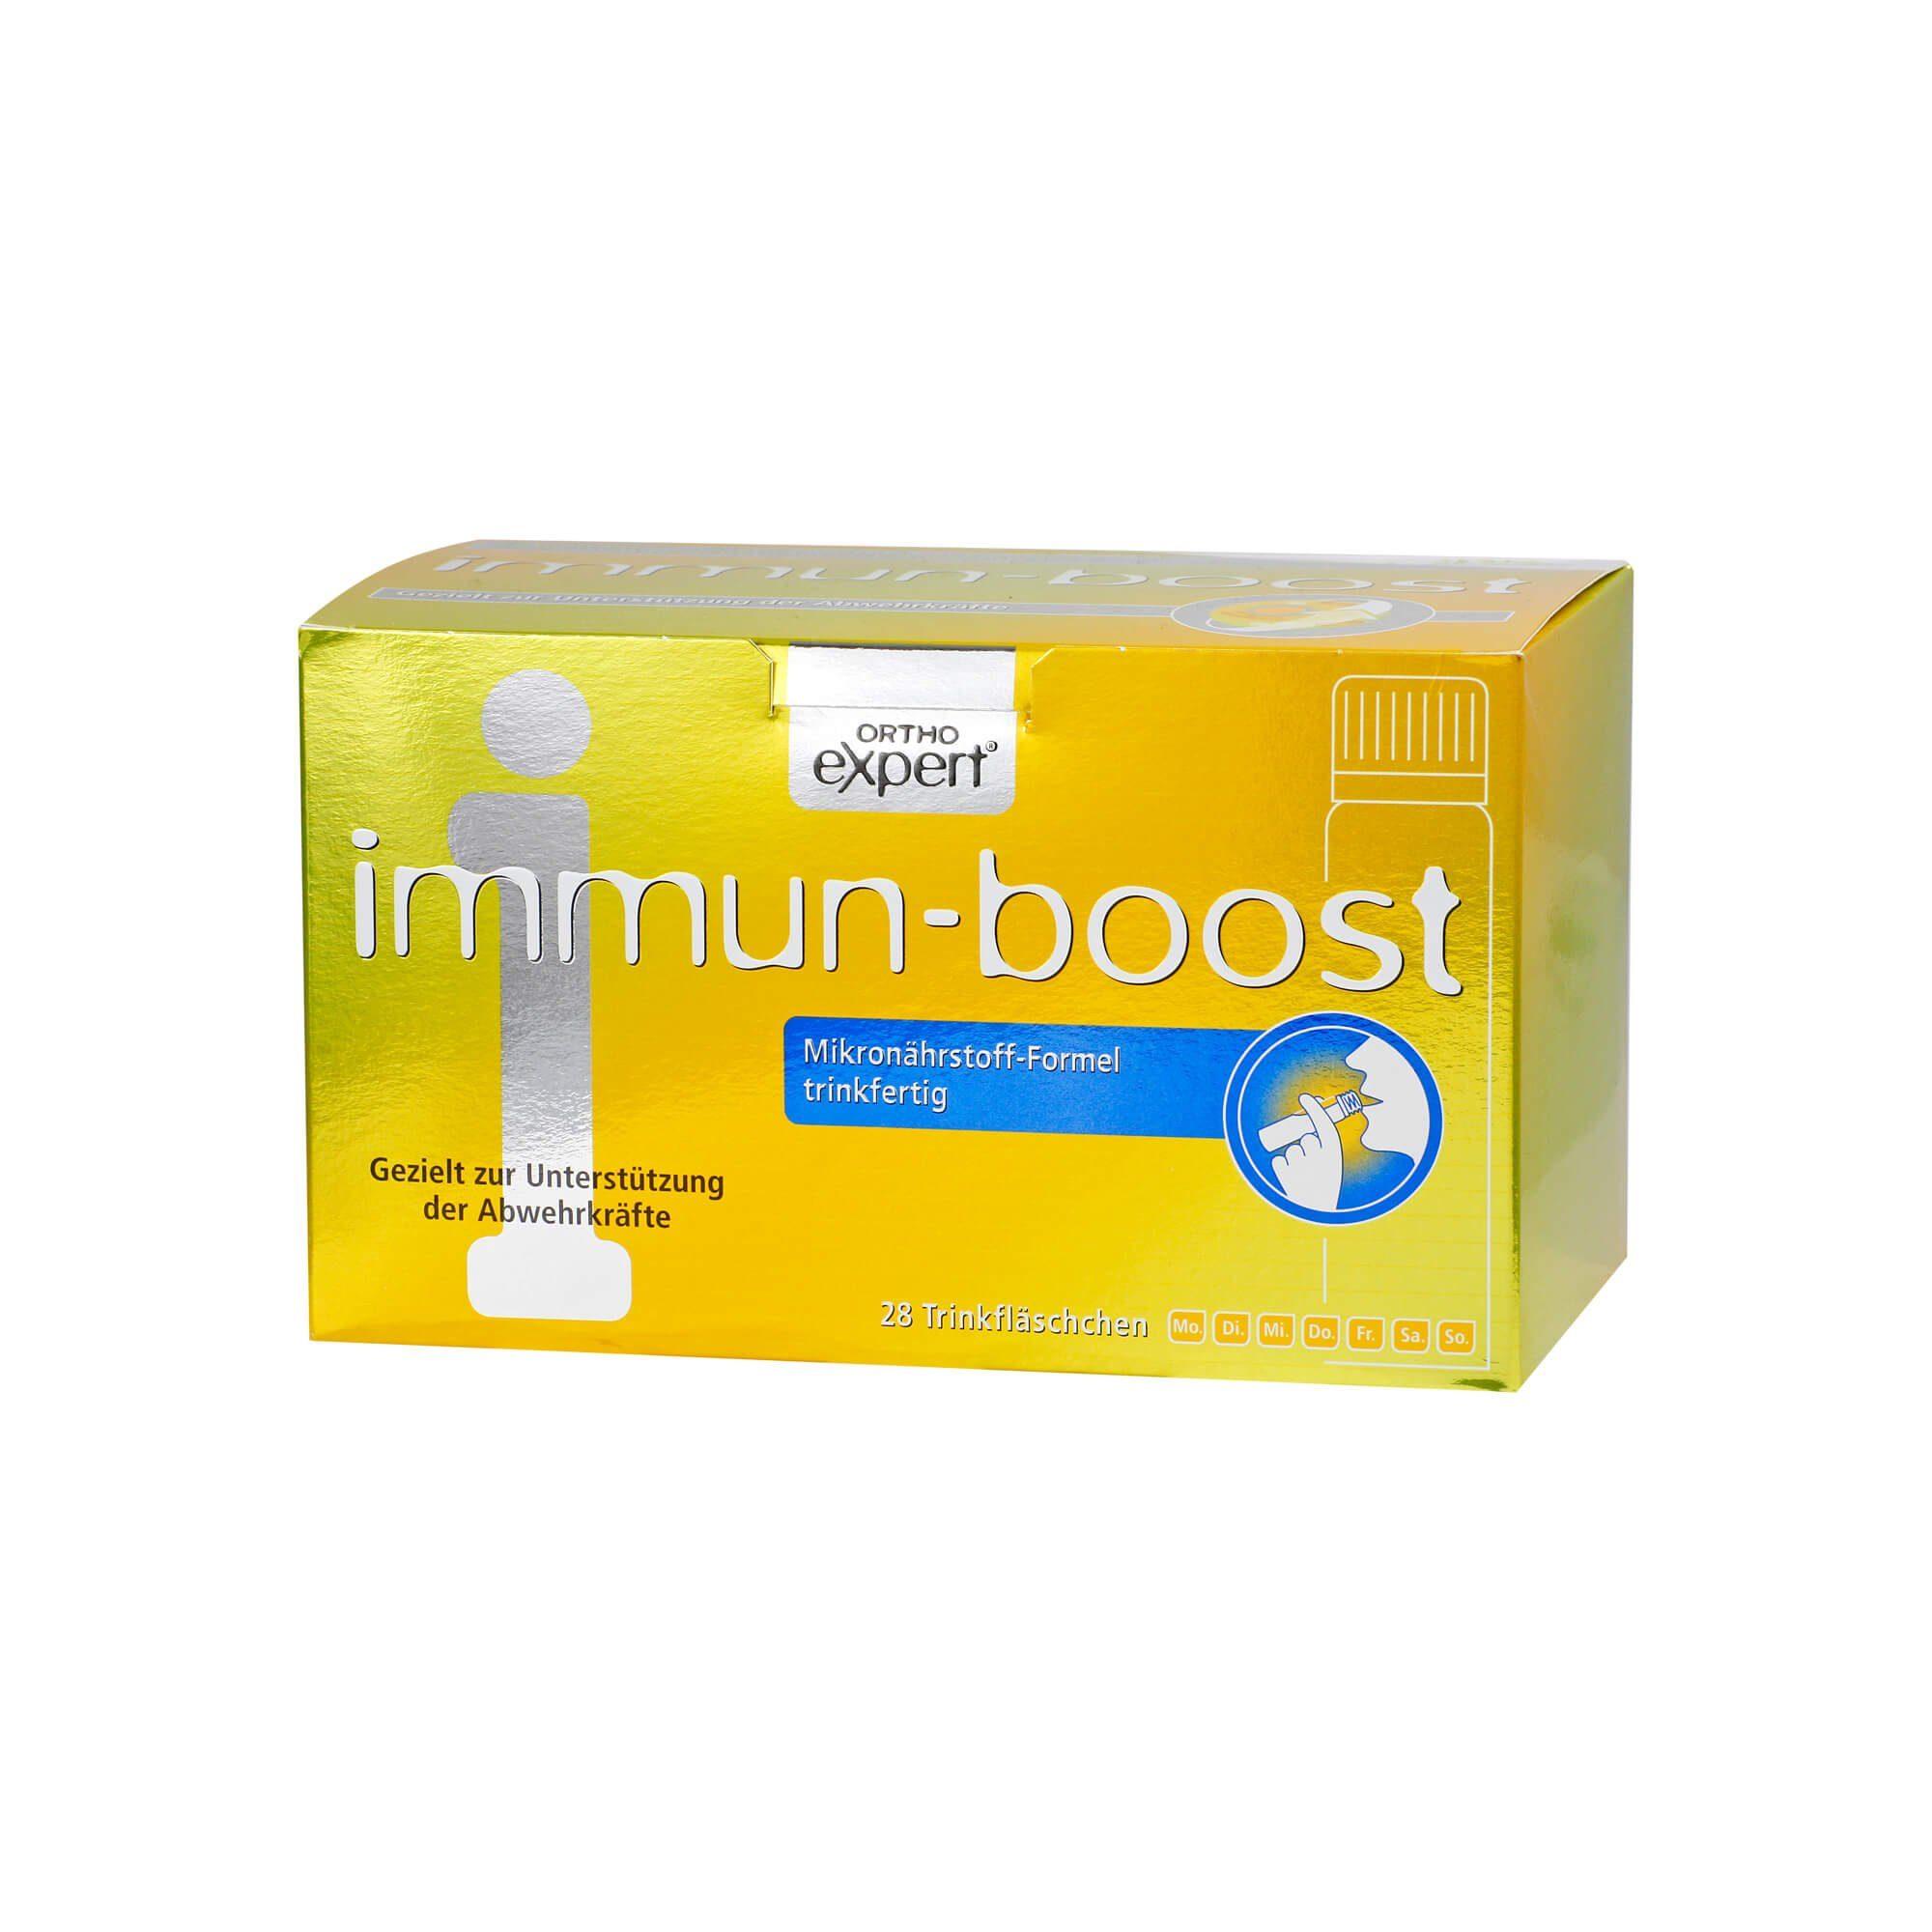 Immun-boost Orthoexpert Trinkampullen, 28X25 ml